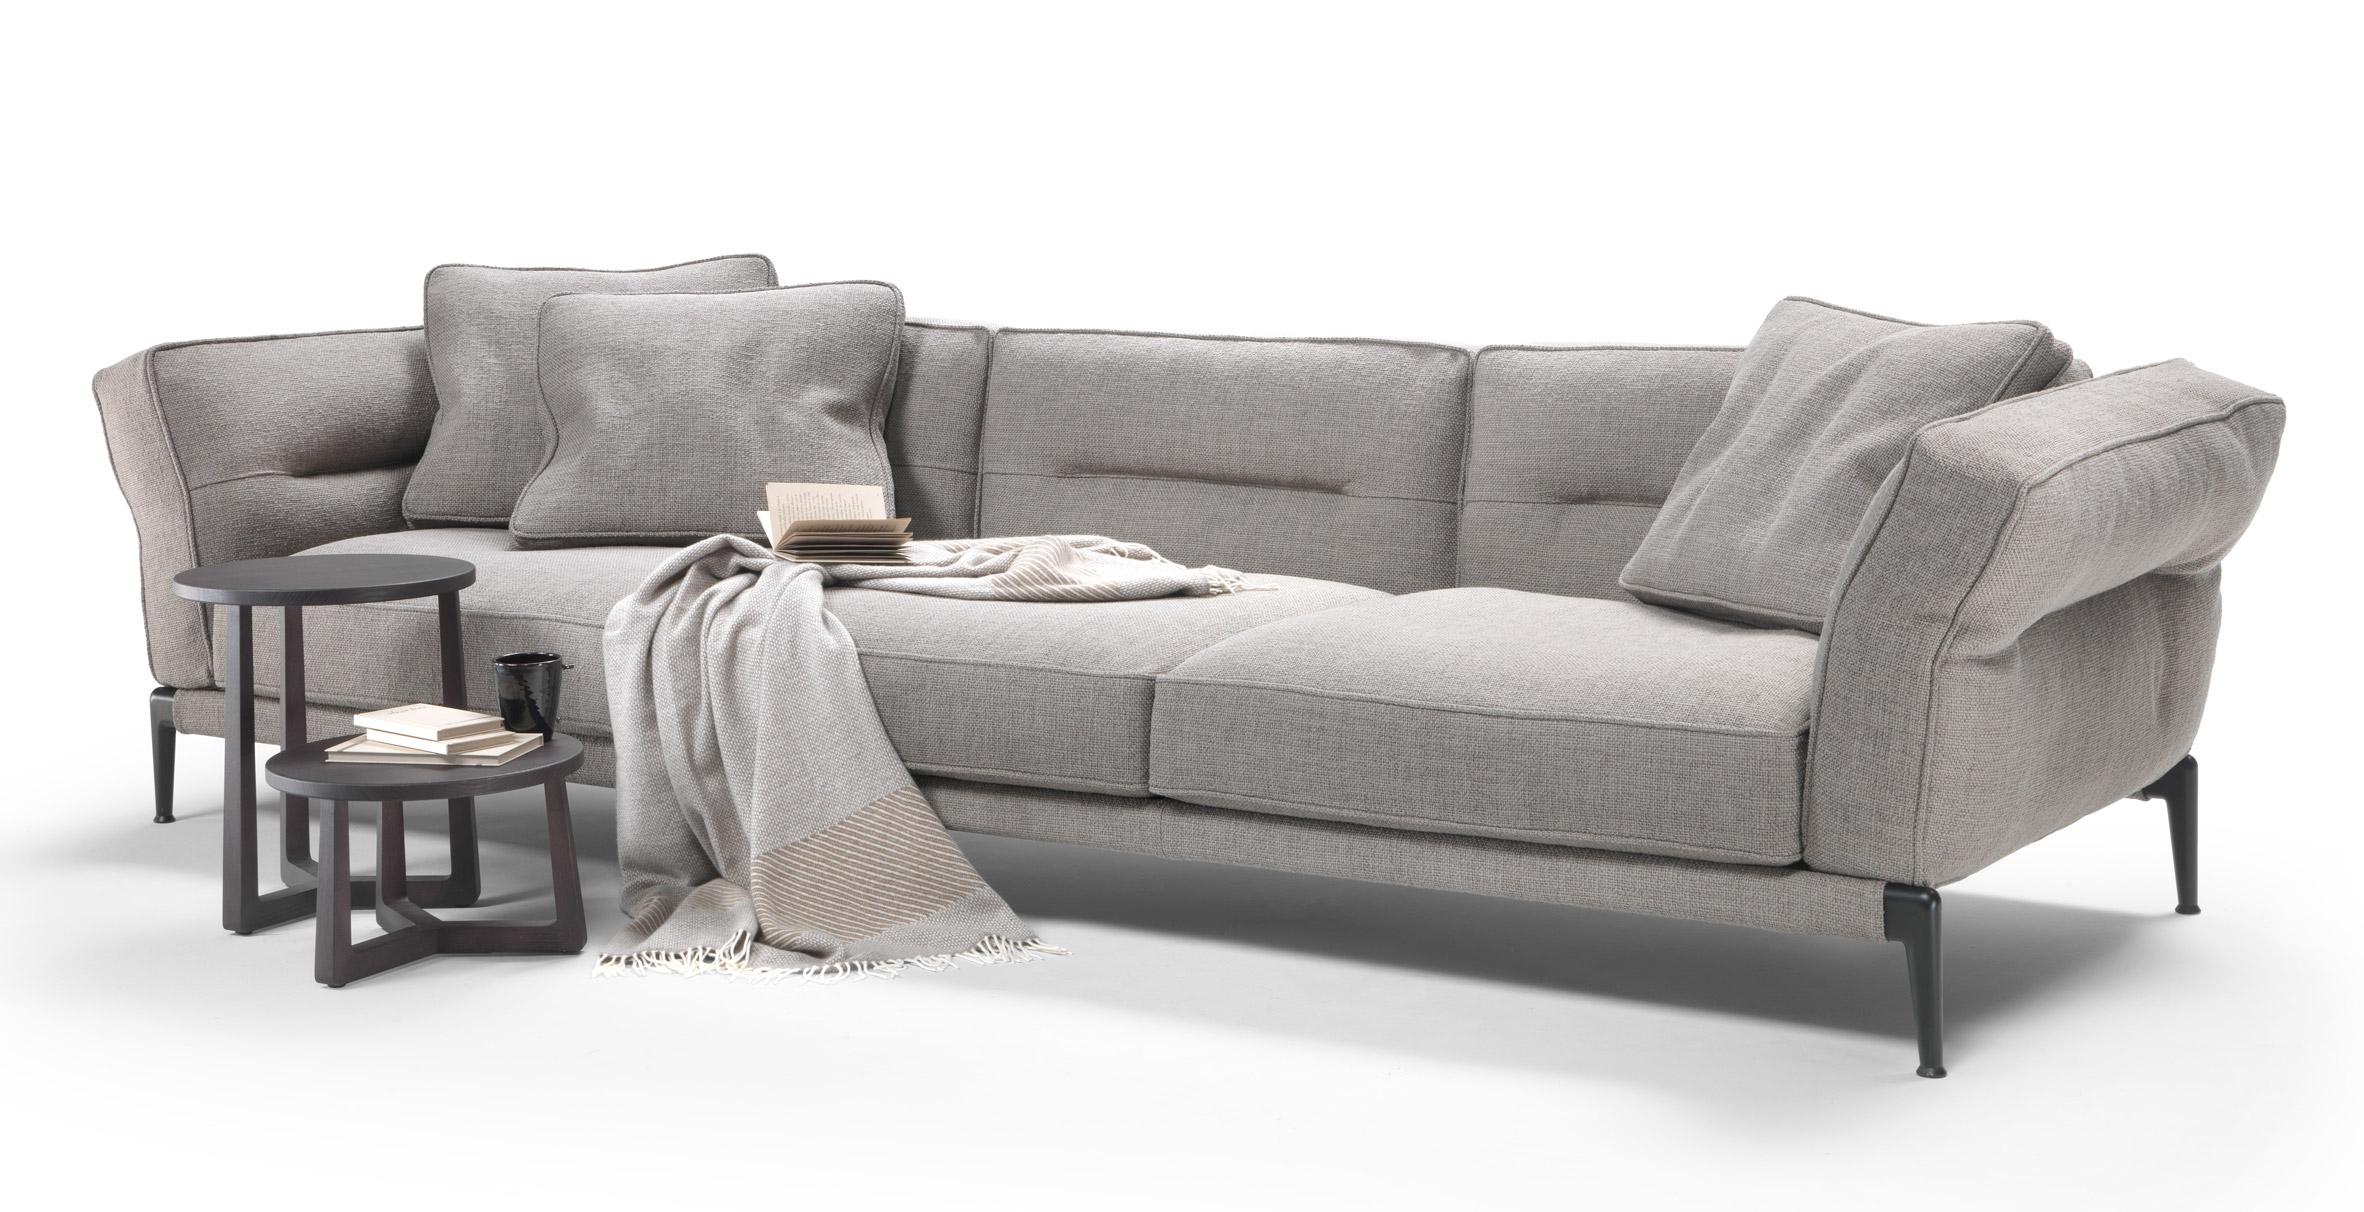 Antonio Citterio designs sofa with linear creases for Flexform